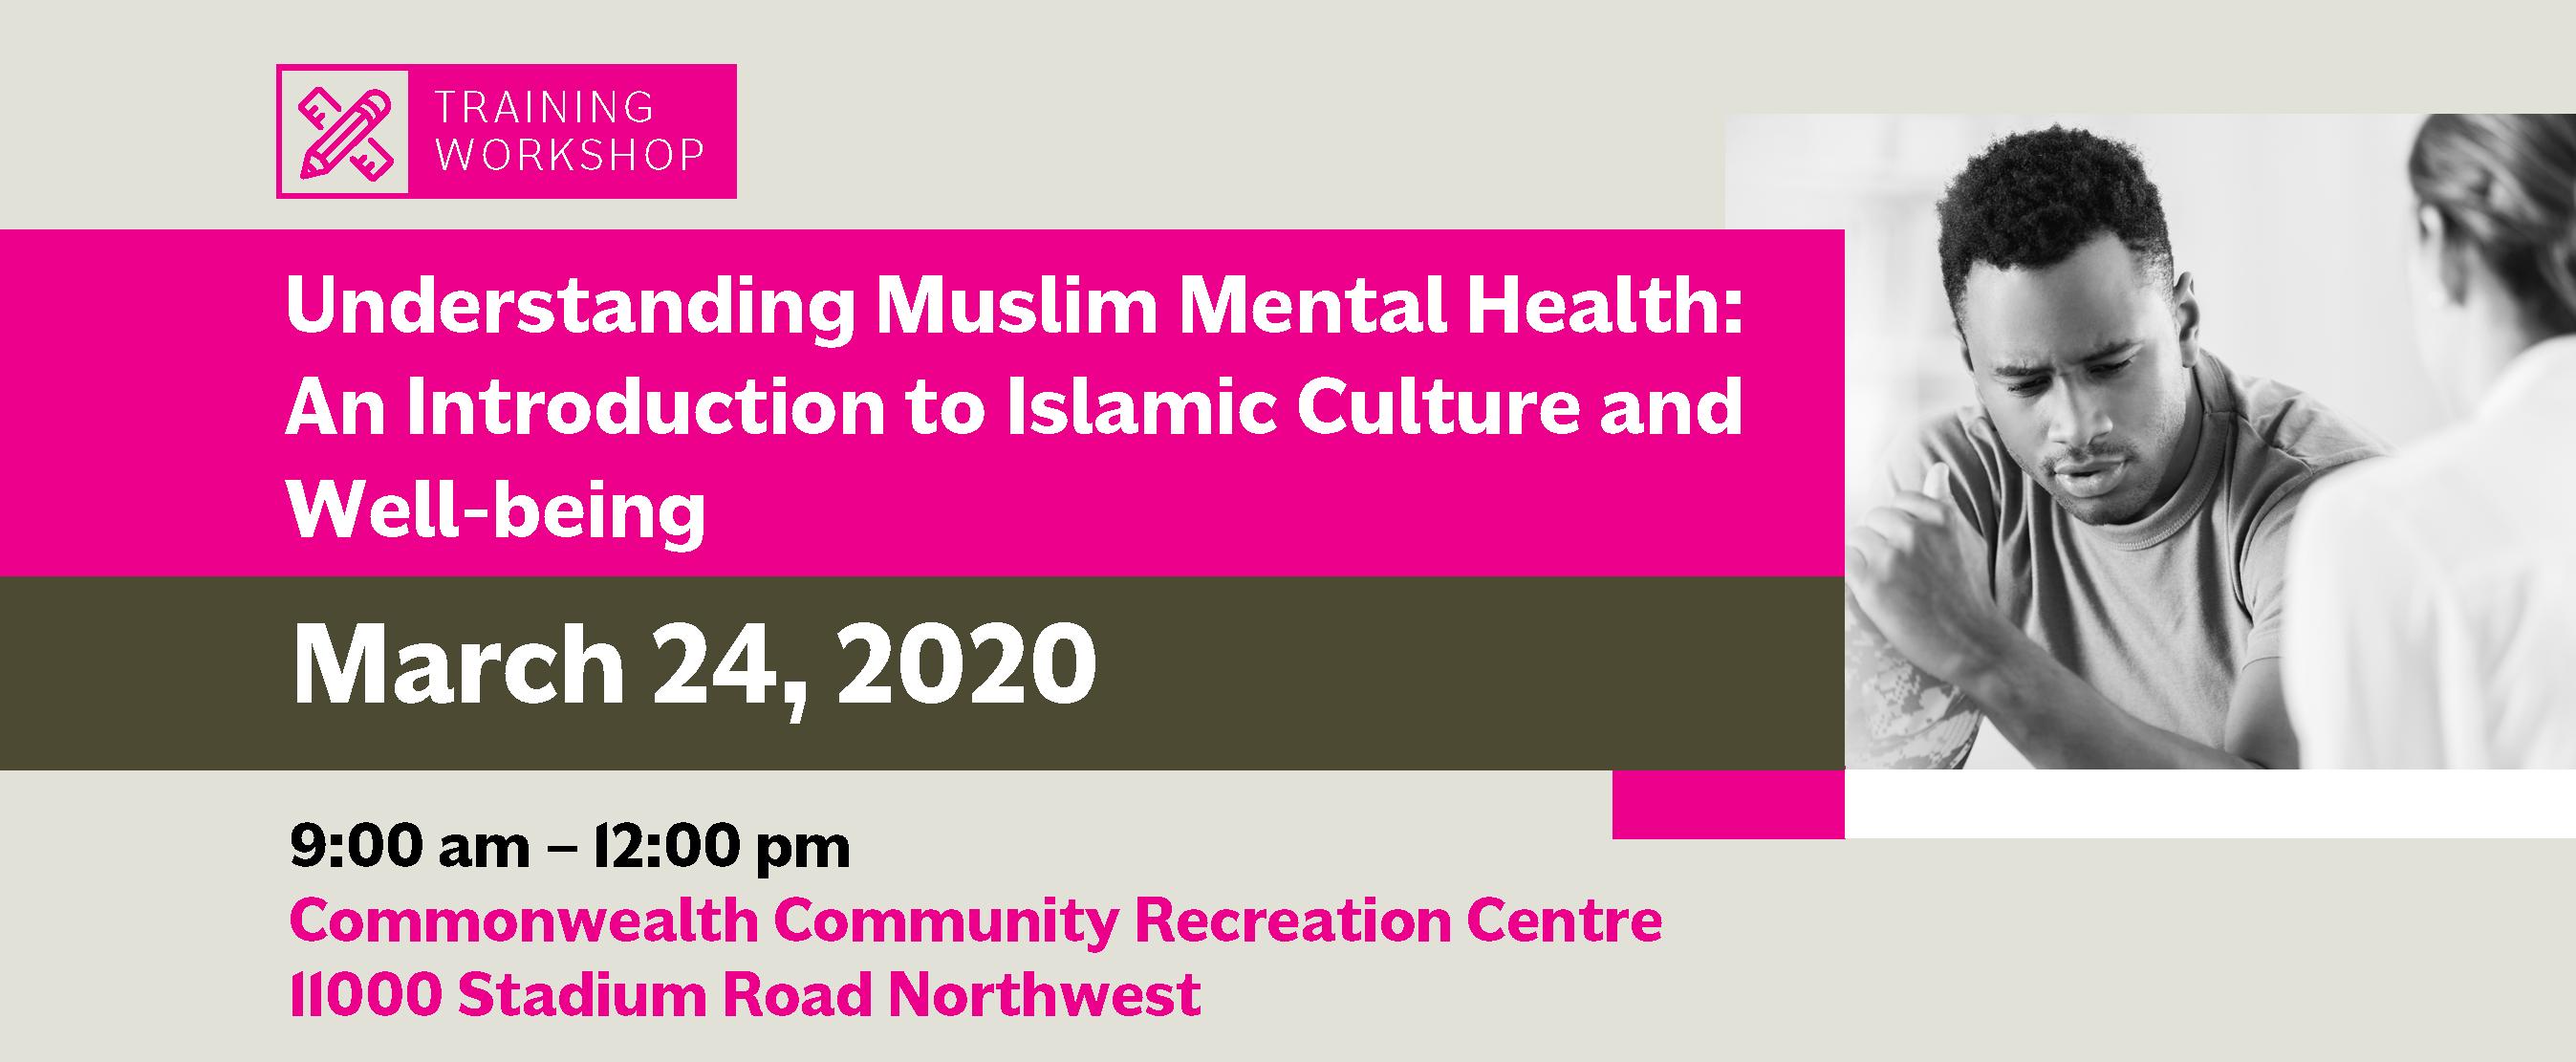 03-24_Muslim Mental Health